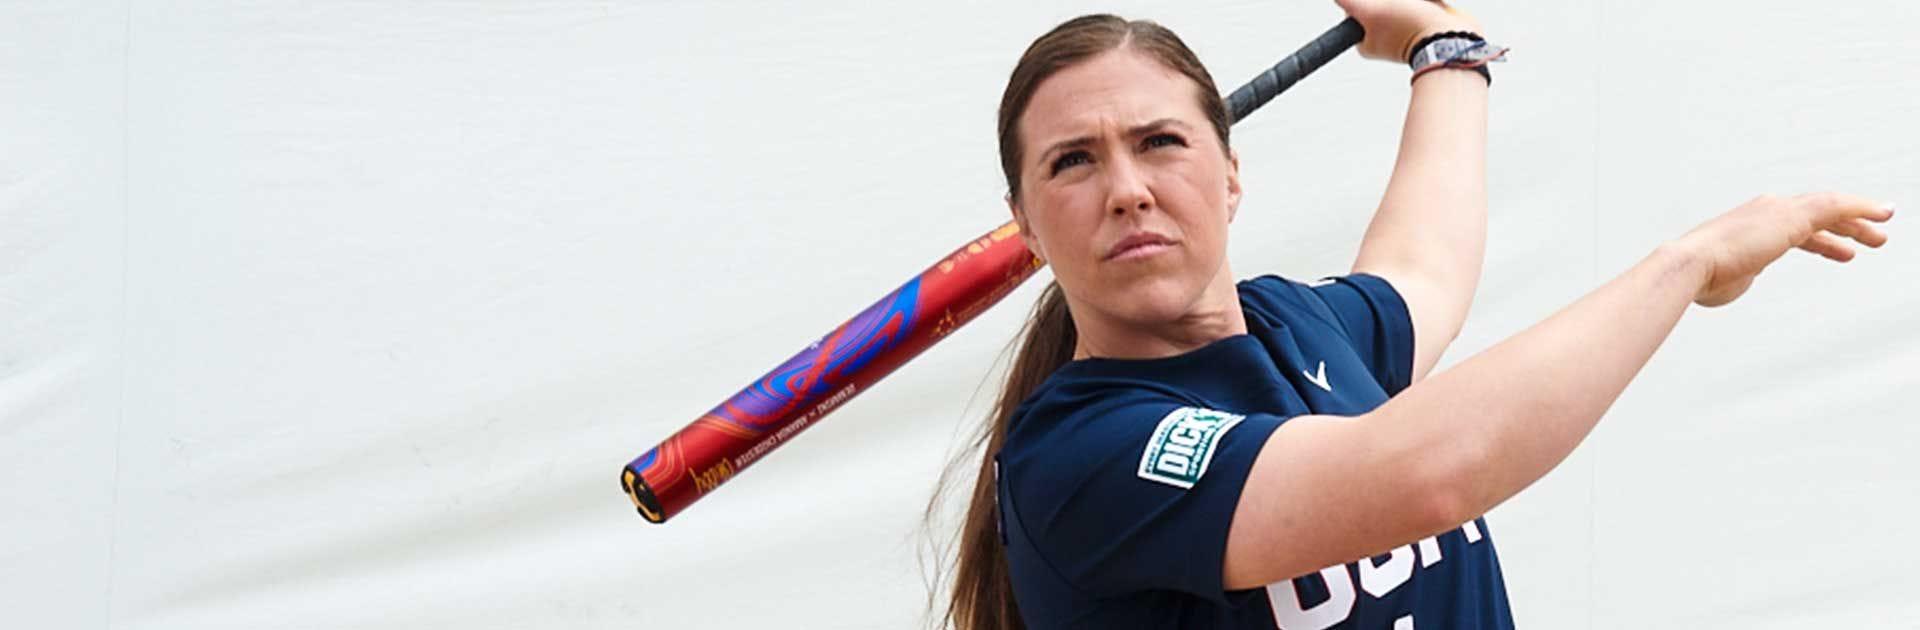 Amanda Chidester swinging a bat